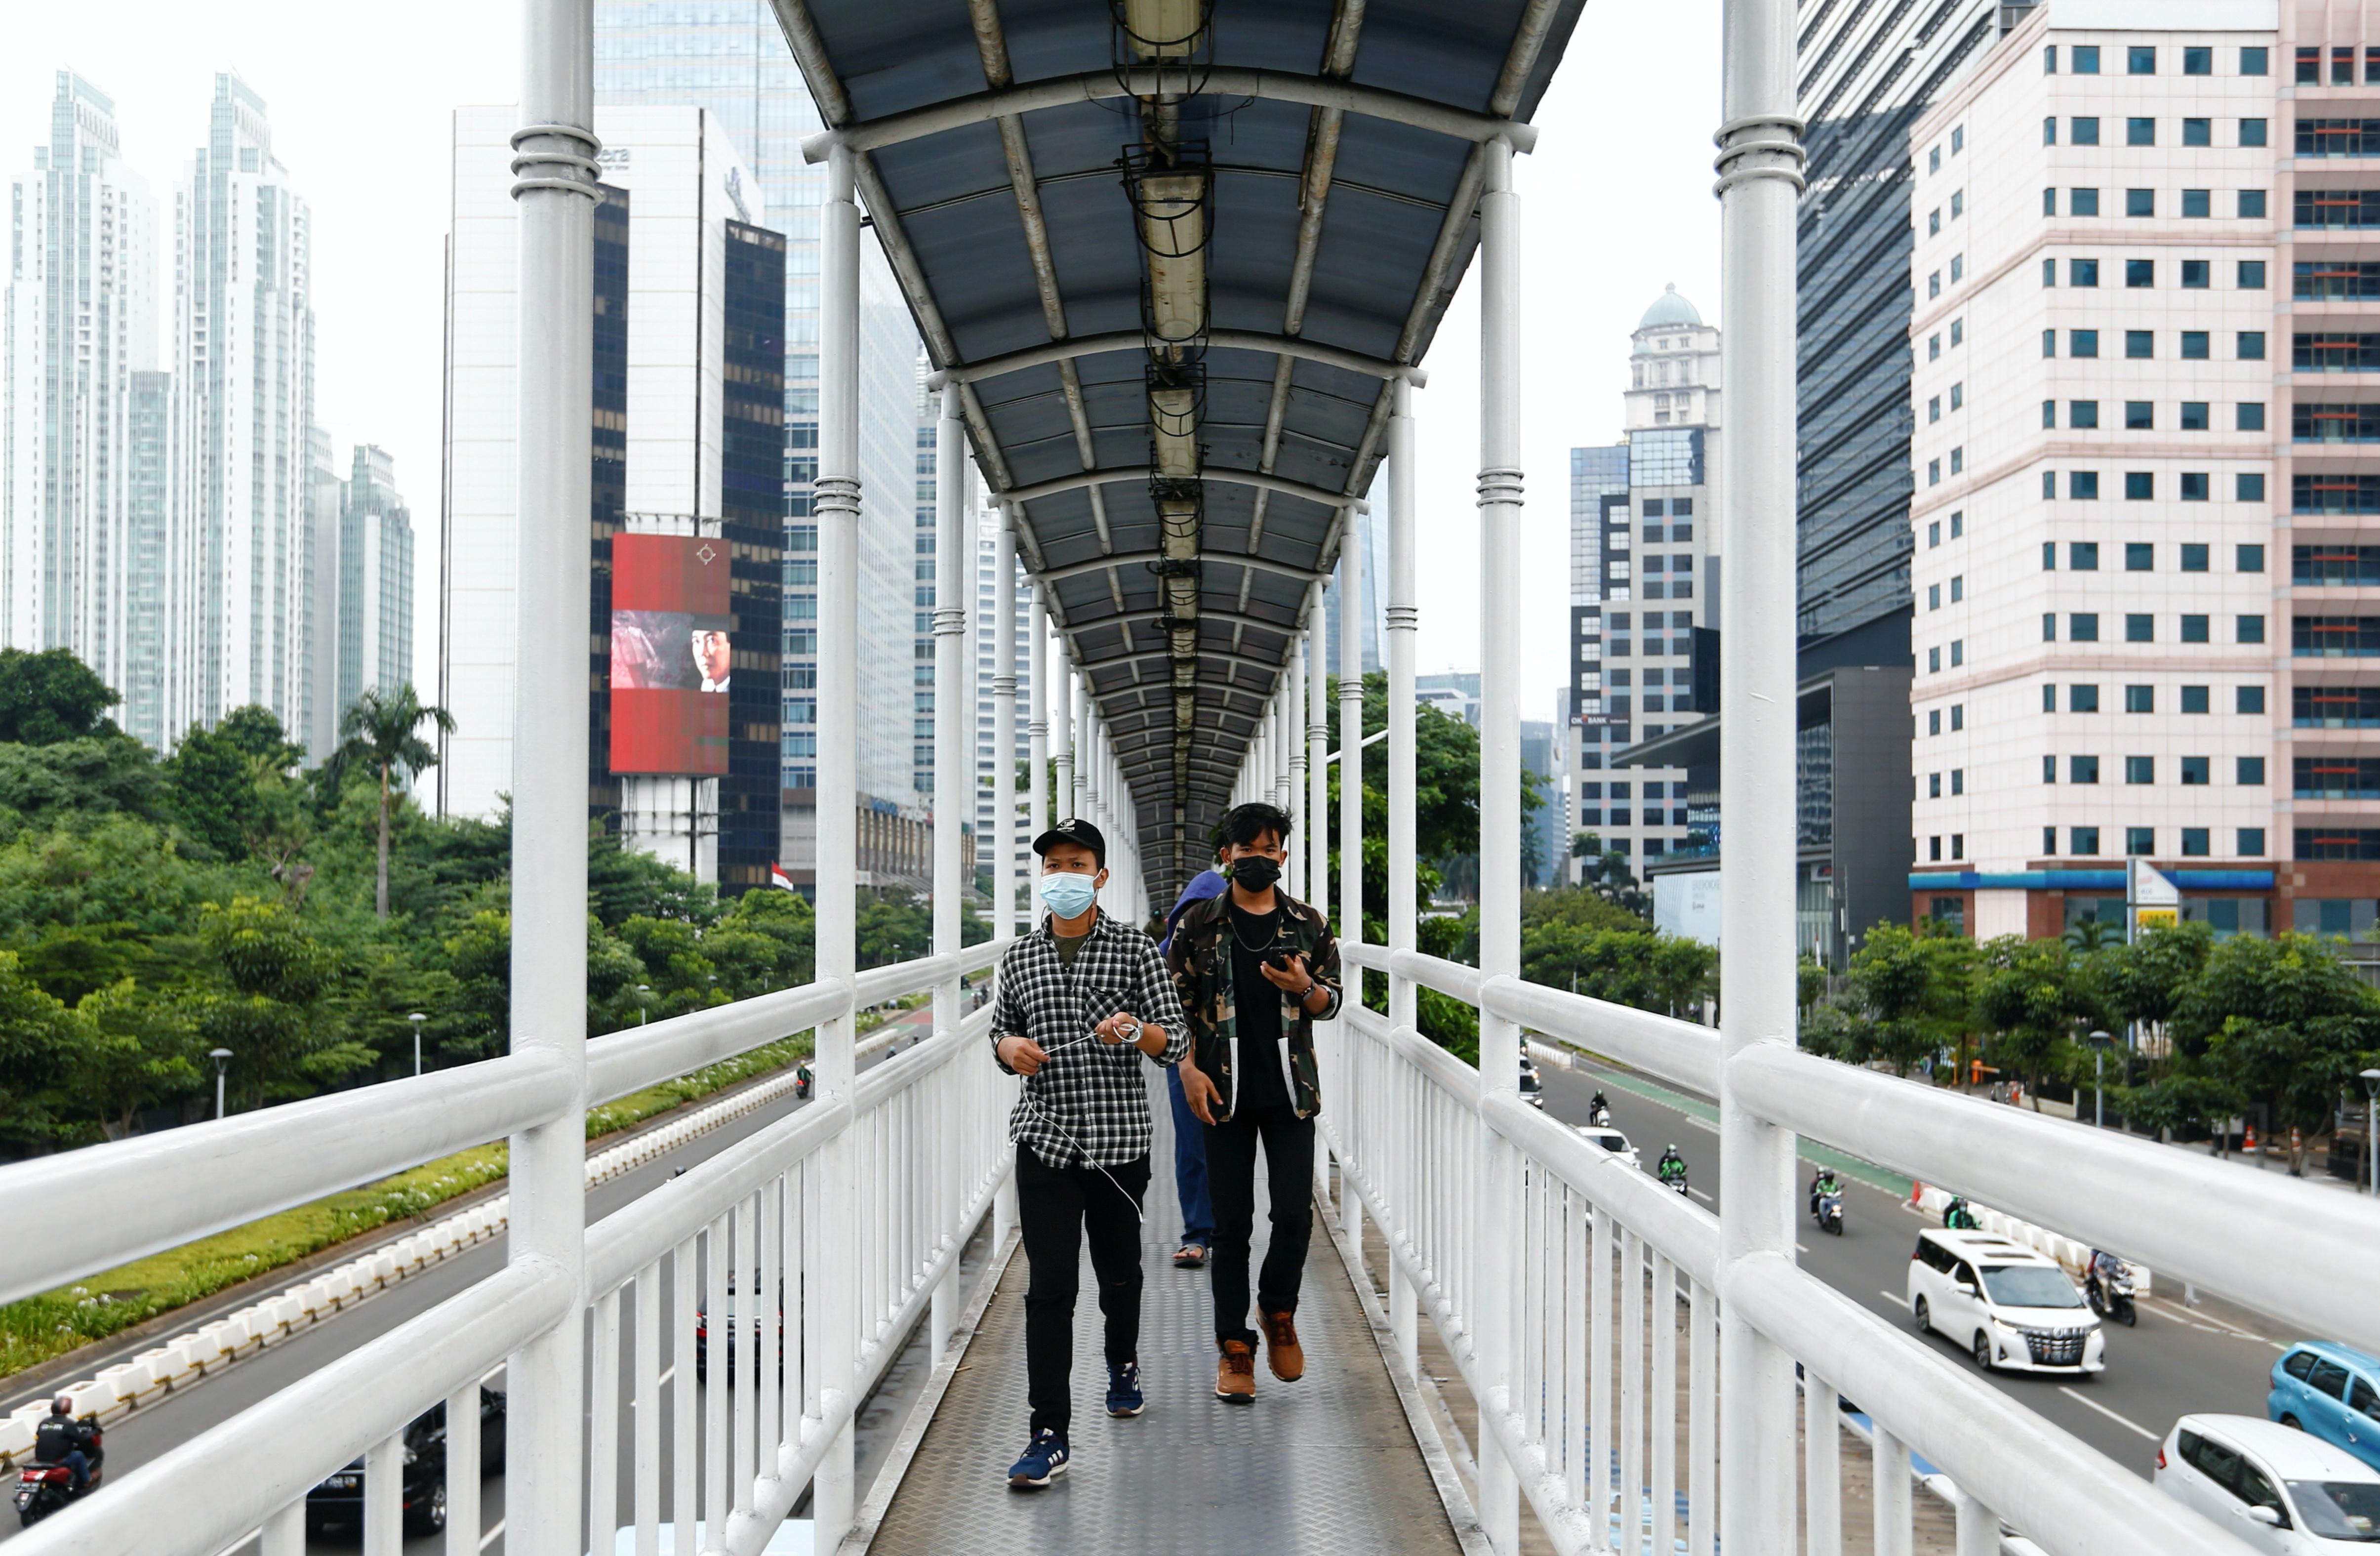 People wearing protective face masks walk on a bridge, amid the coronavirus disease (COVID-19) pandemic, in Jakarta, Indonesia, June 17, 2021. REUTERS/Ajeng Dinar Ulfiana